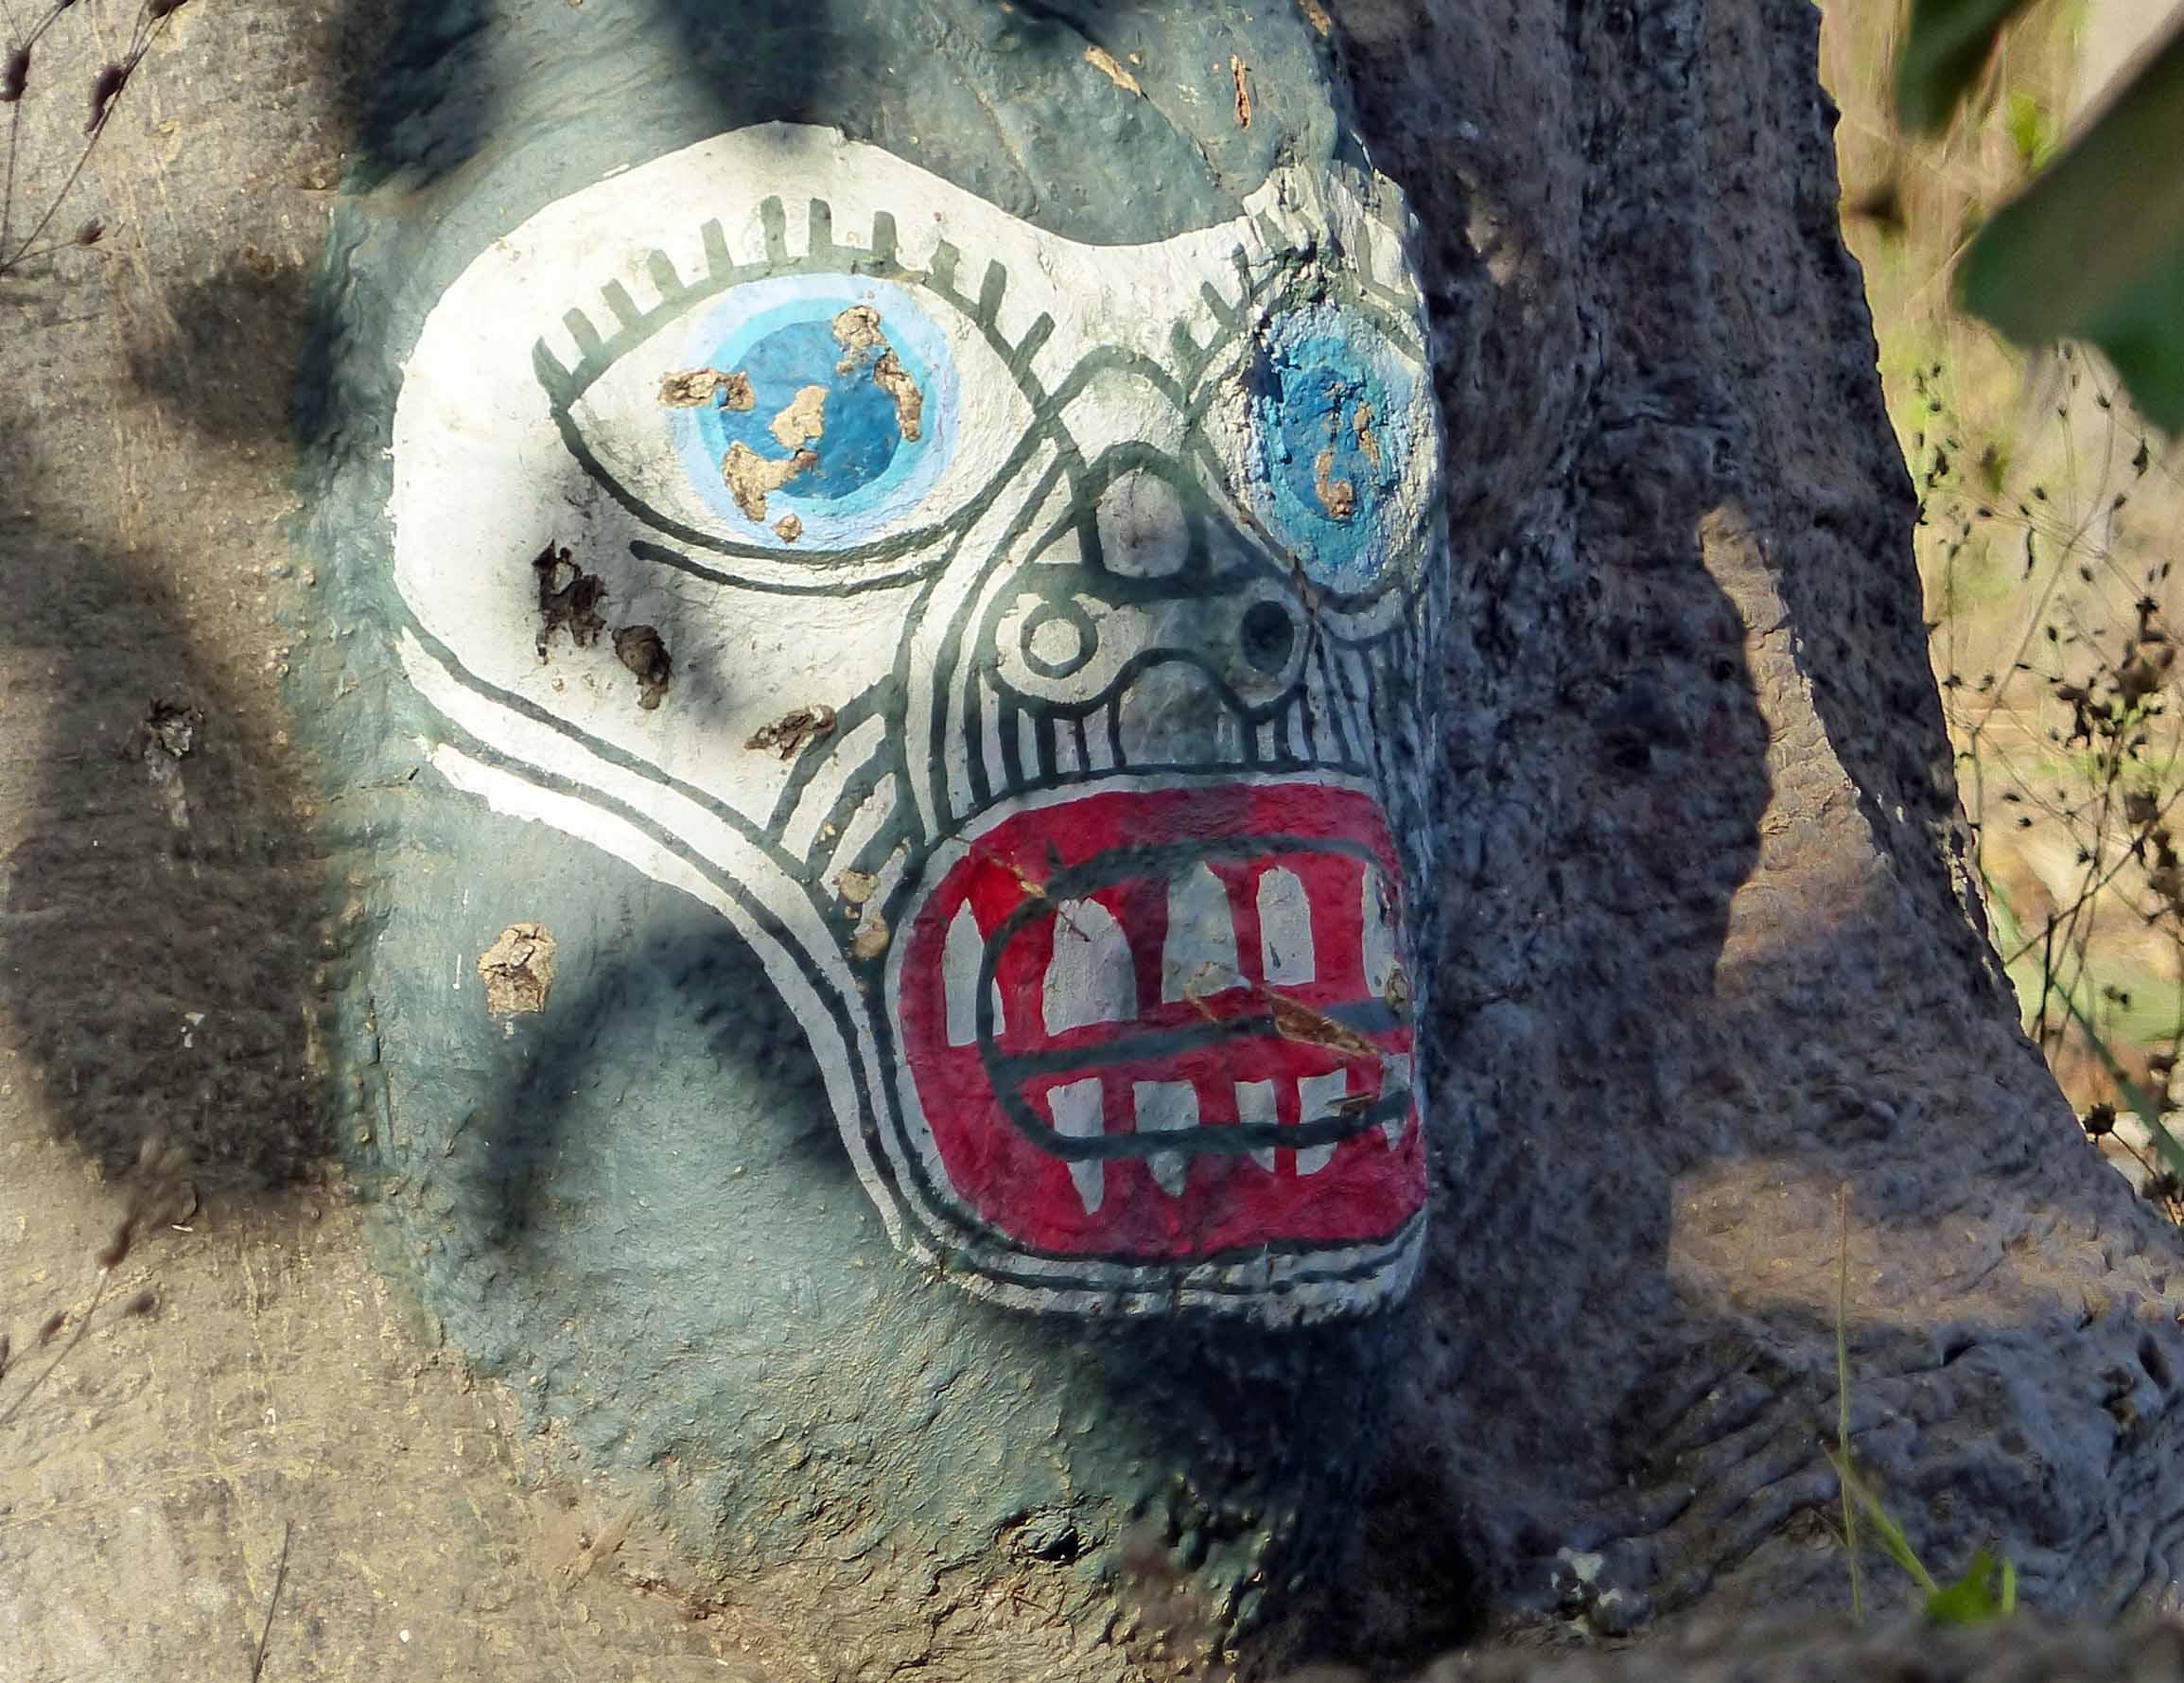 Fierce face painted on tree trunk